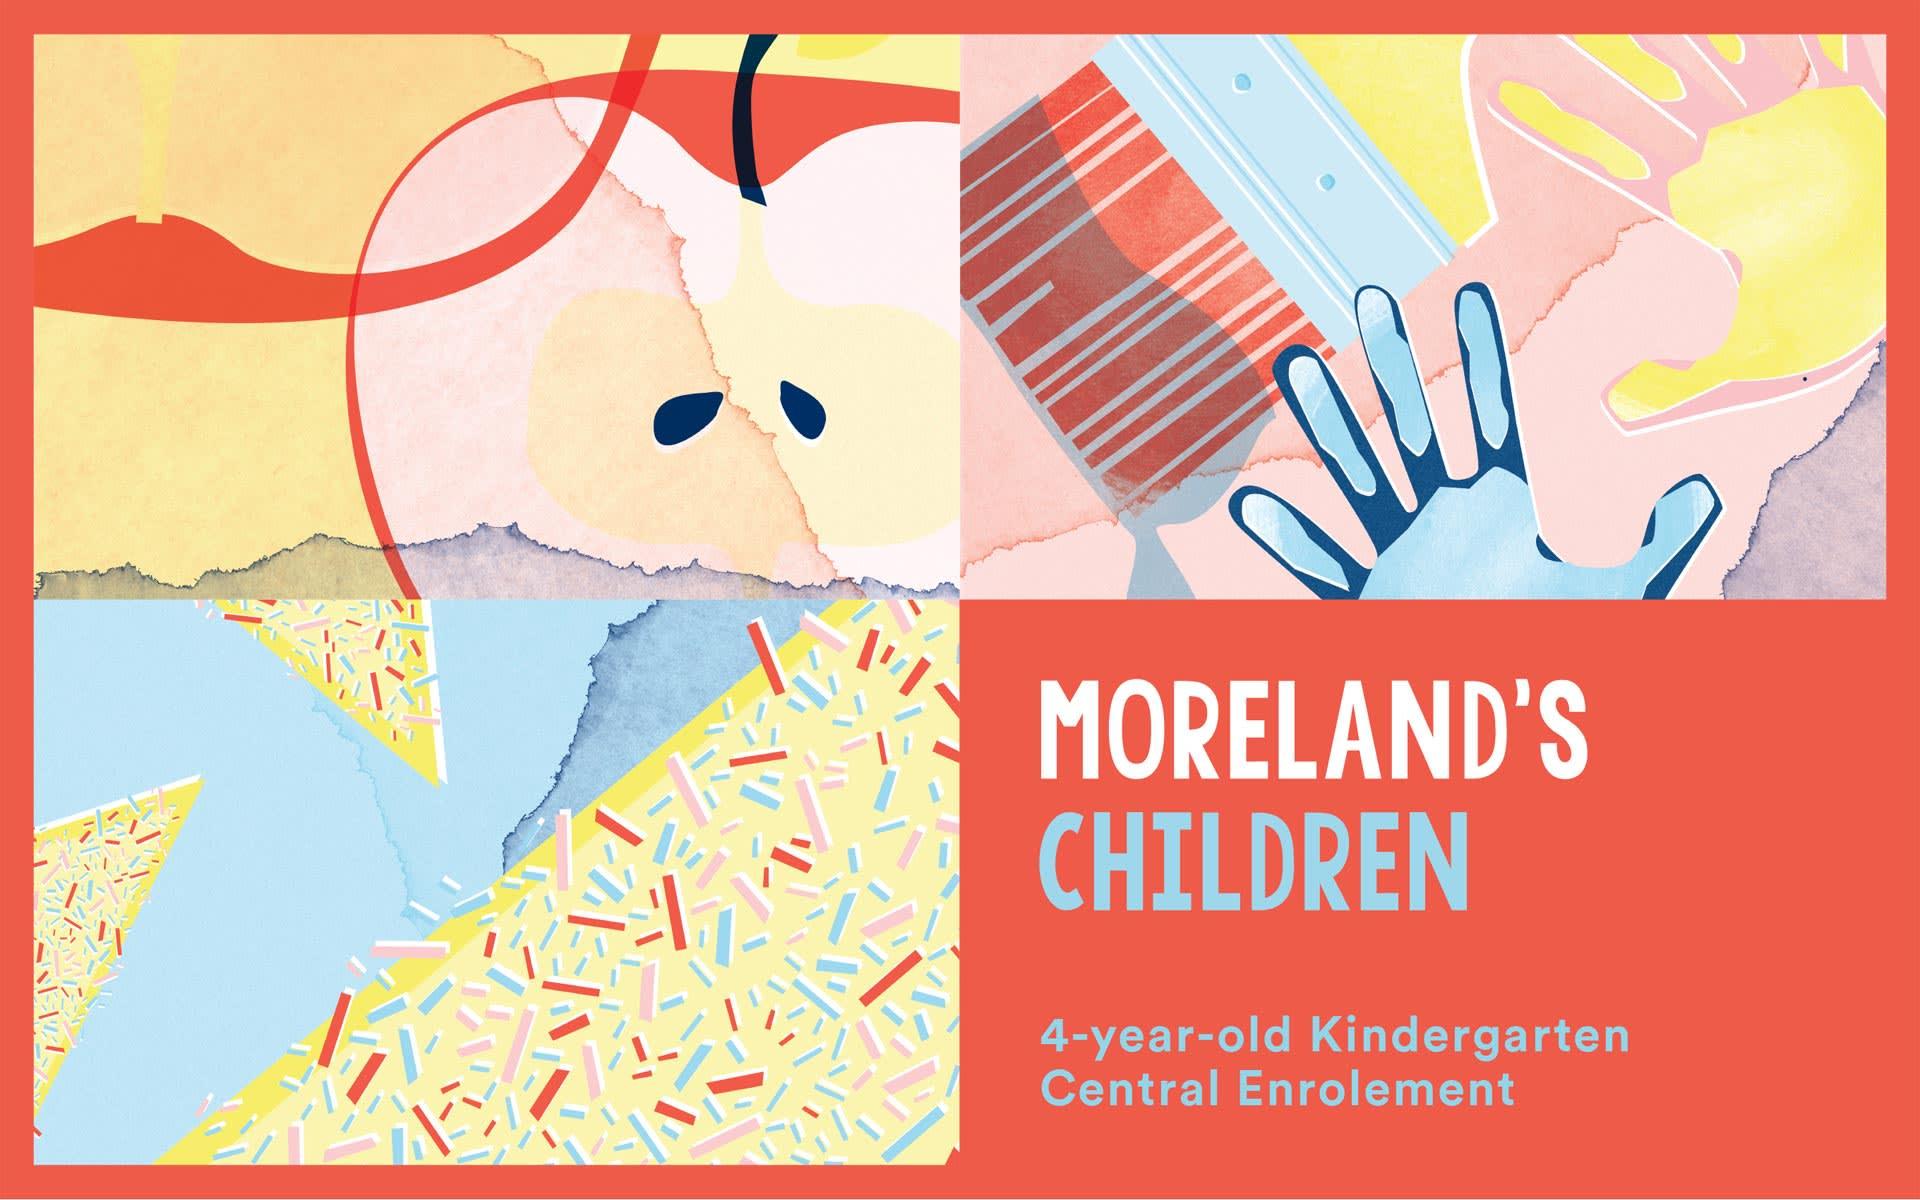 Moreland-City-Council-Brand-Identity